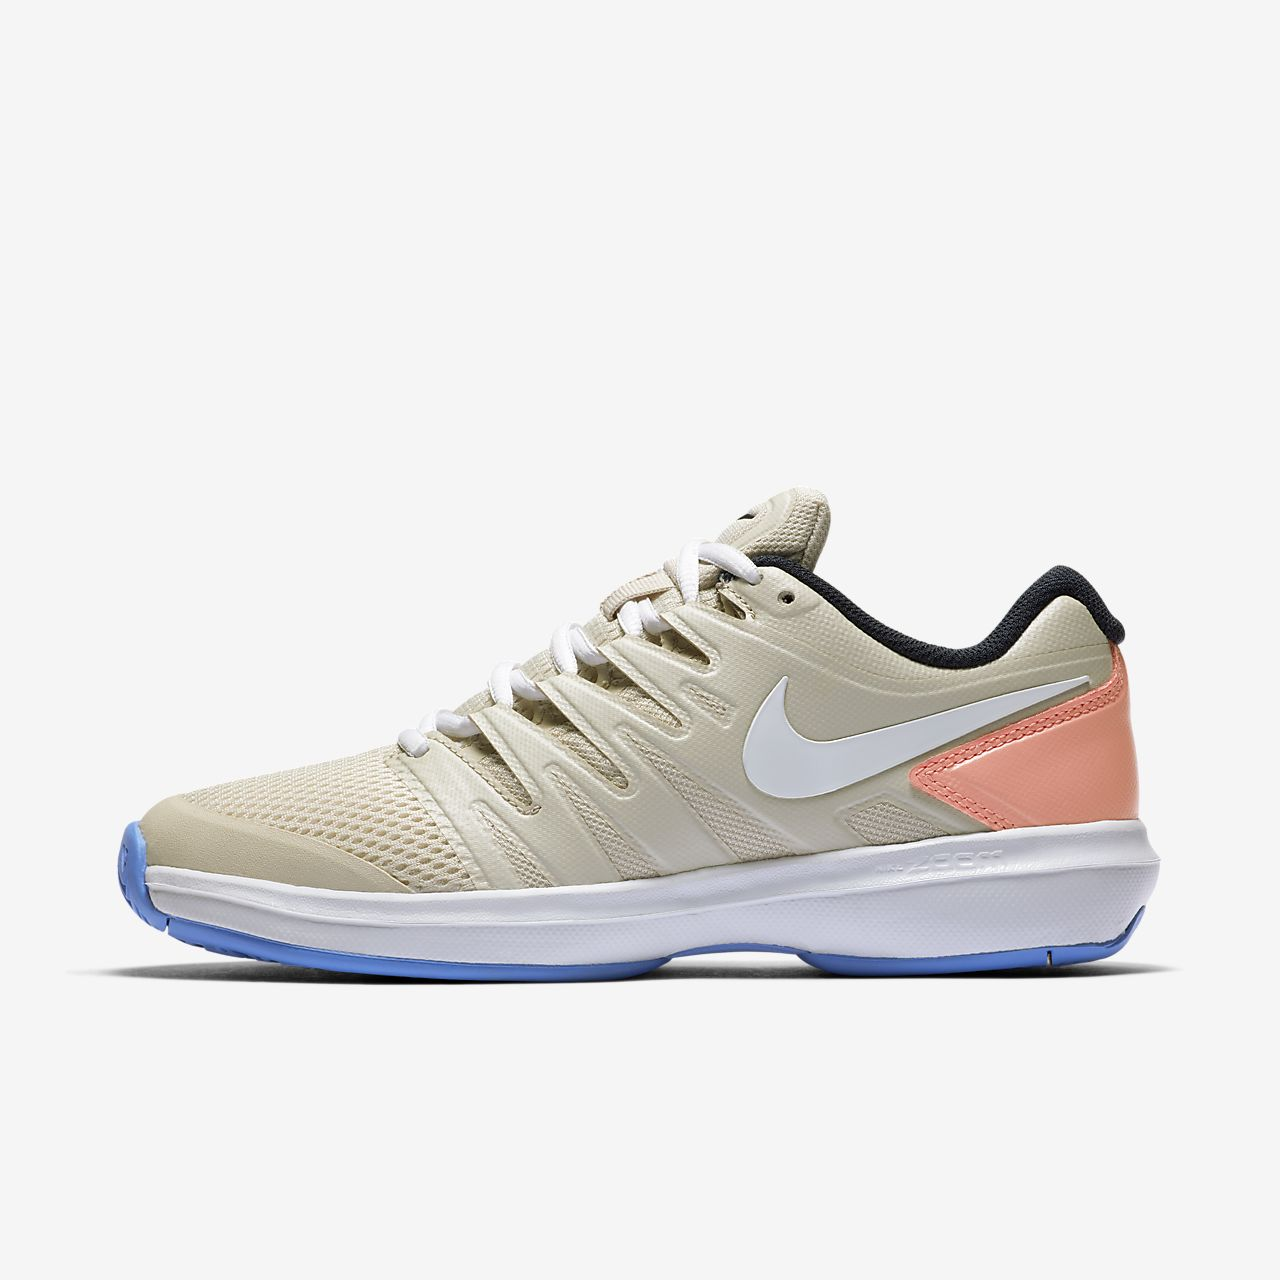 NikeCourt Air Zoom Prestige Women's Tennis Shoe